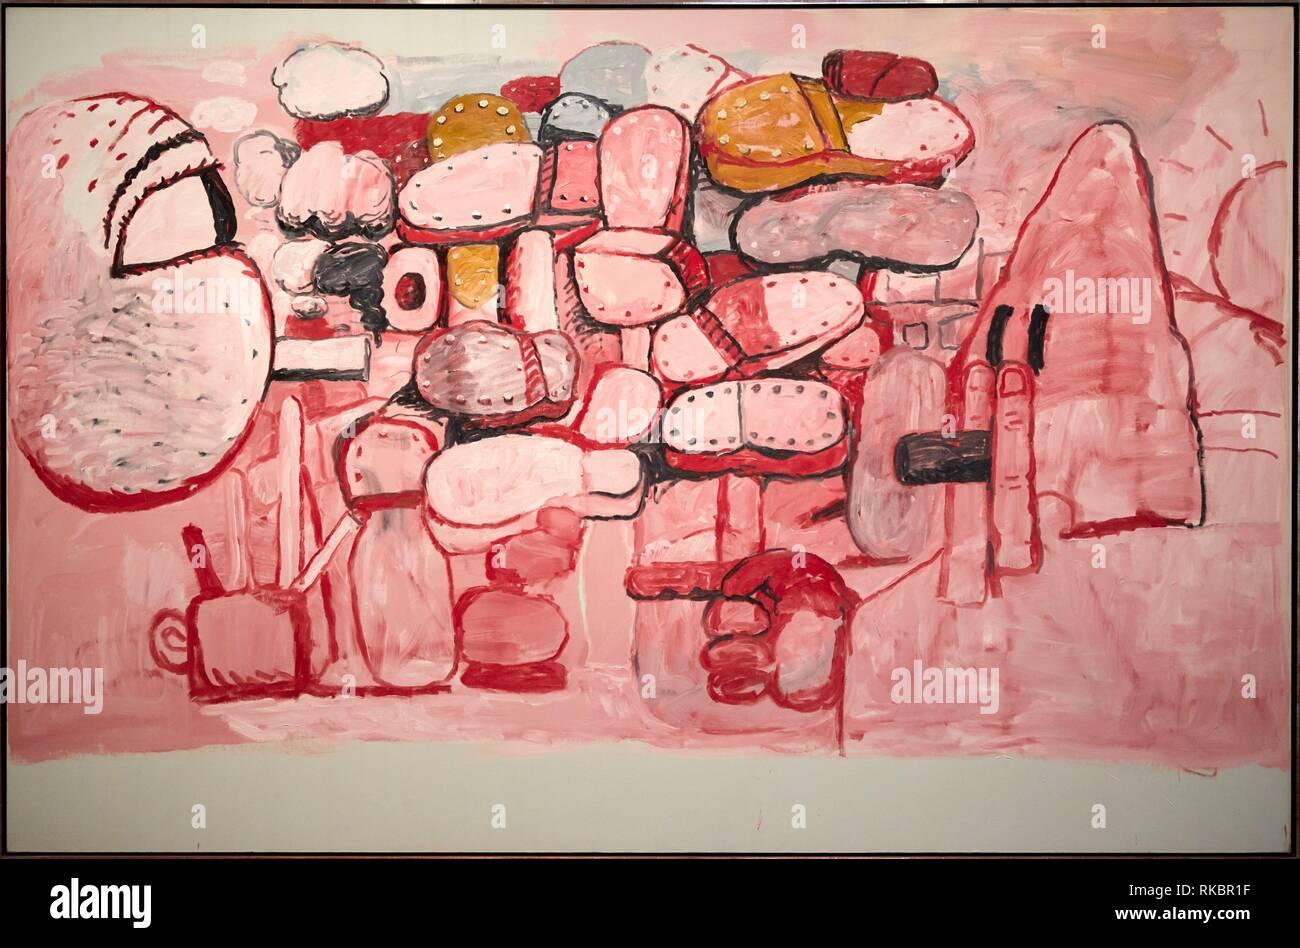 Konfrontation, 1974, Philip Guston, Museo Nacional Centro de Arte Reina Sofia, Madrid, Spanien, Europa Stockbild